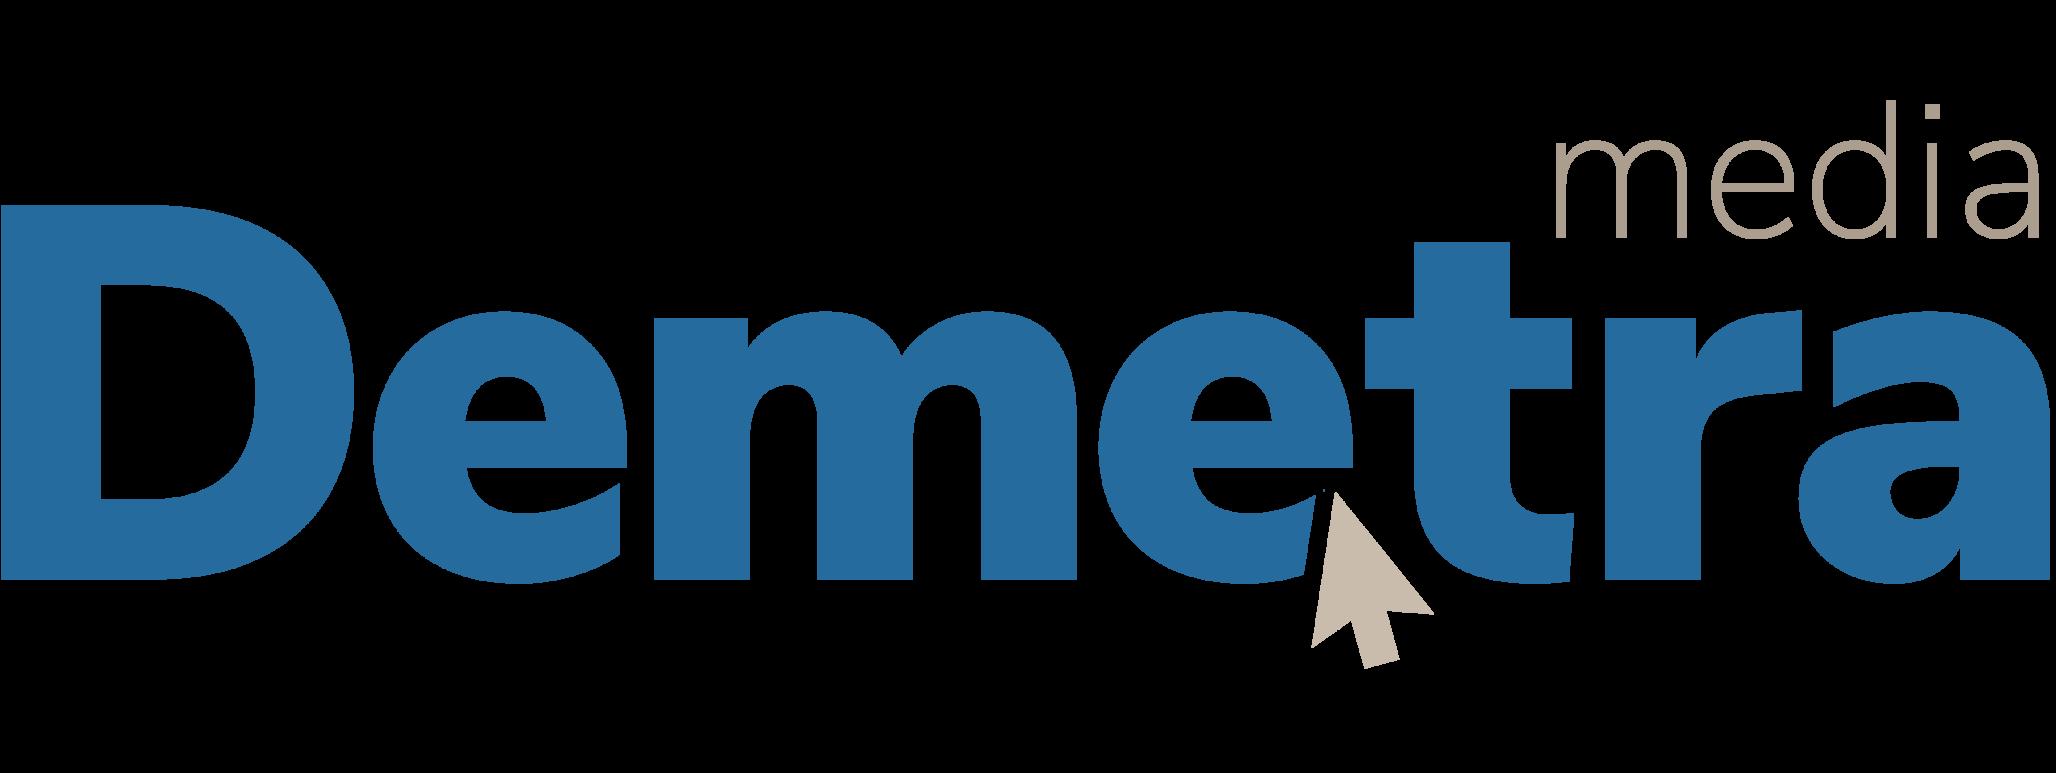 Demetra Media